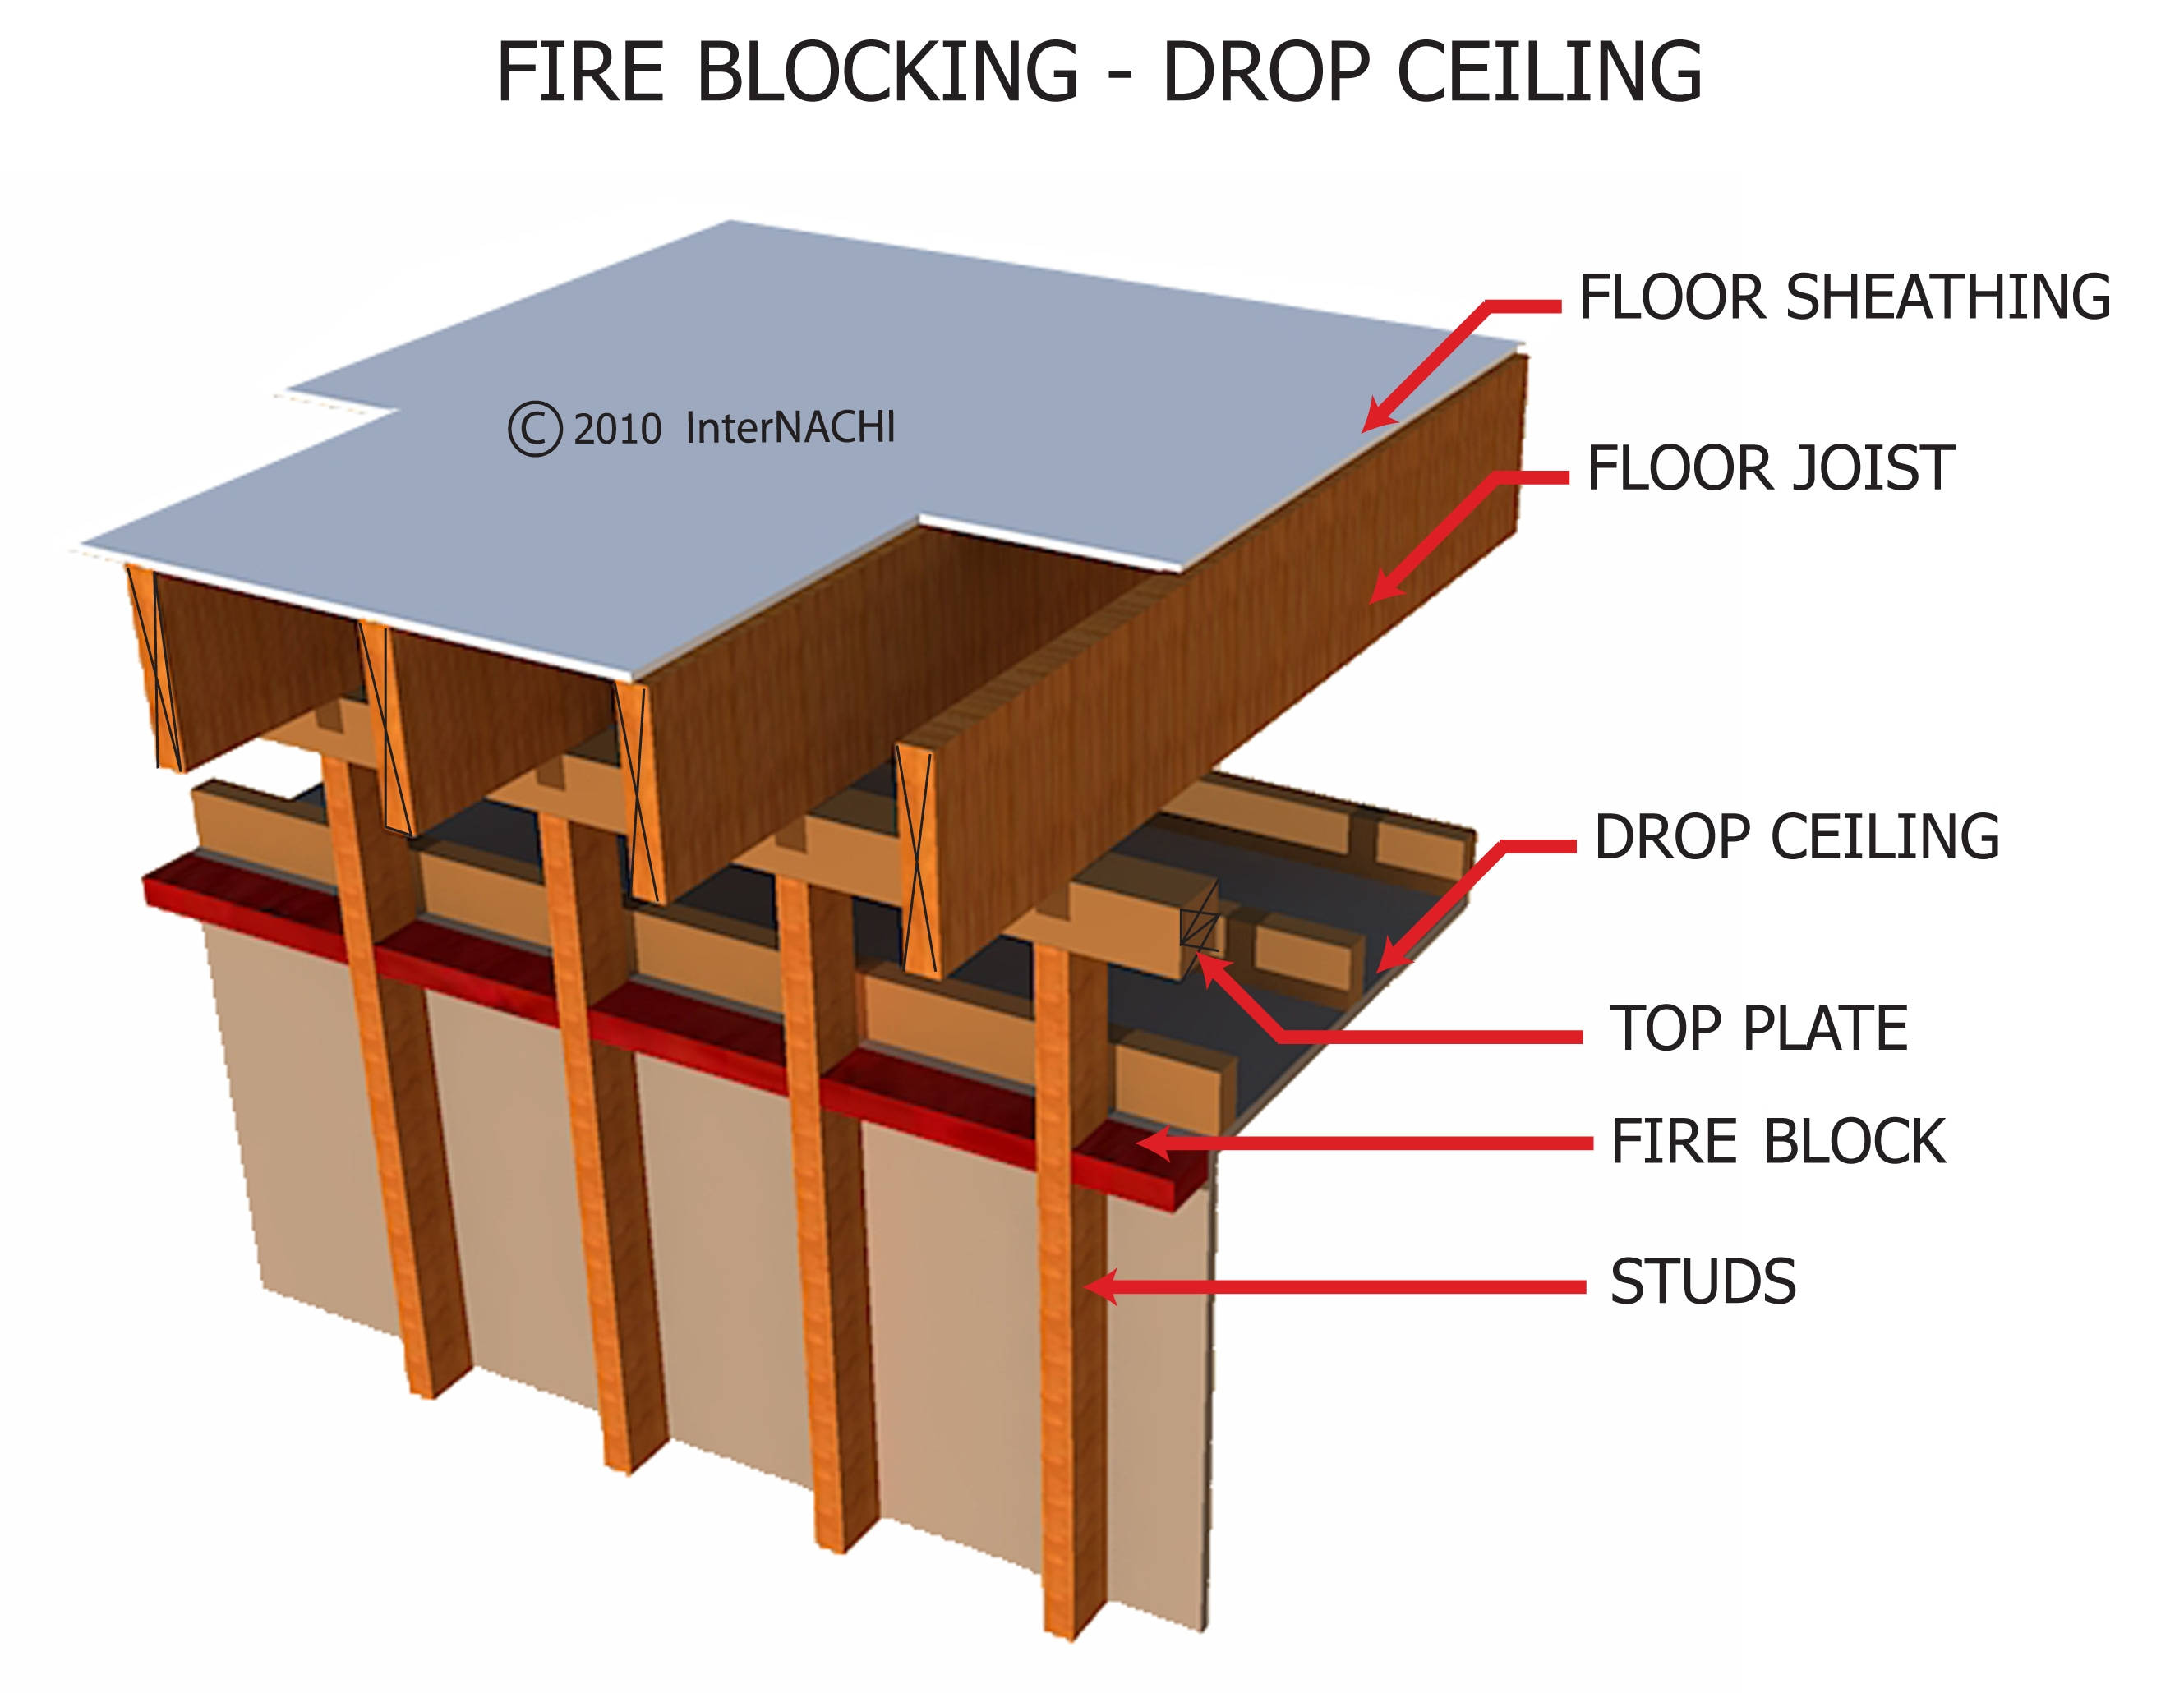 Fire blocking - drop ceiling.